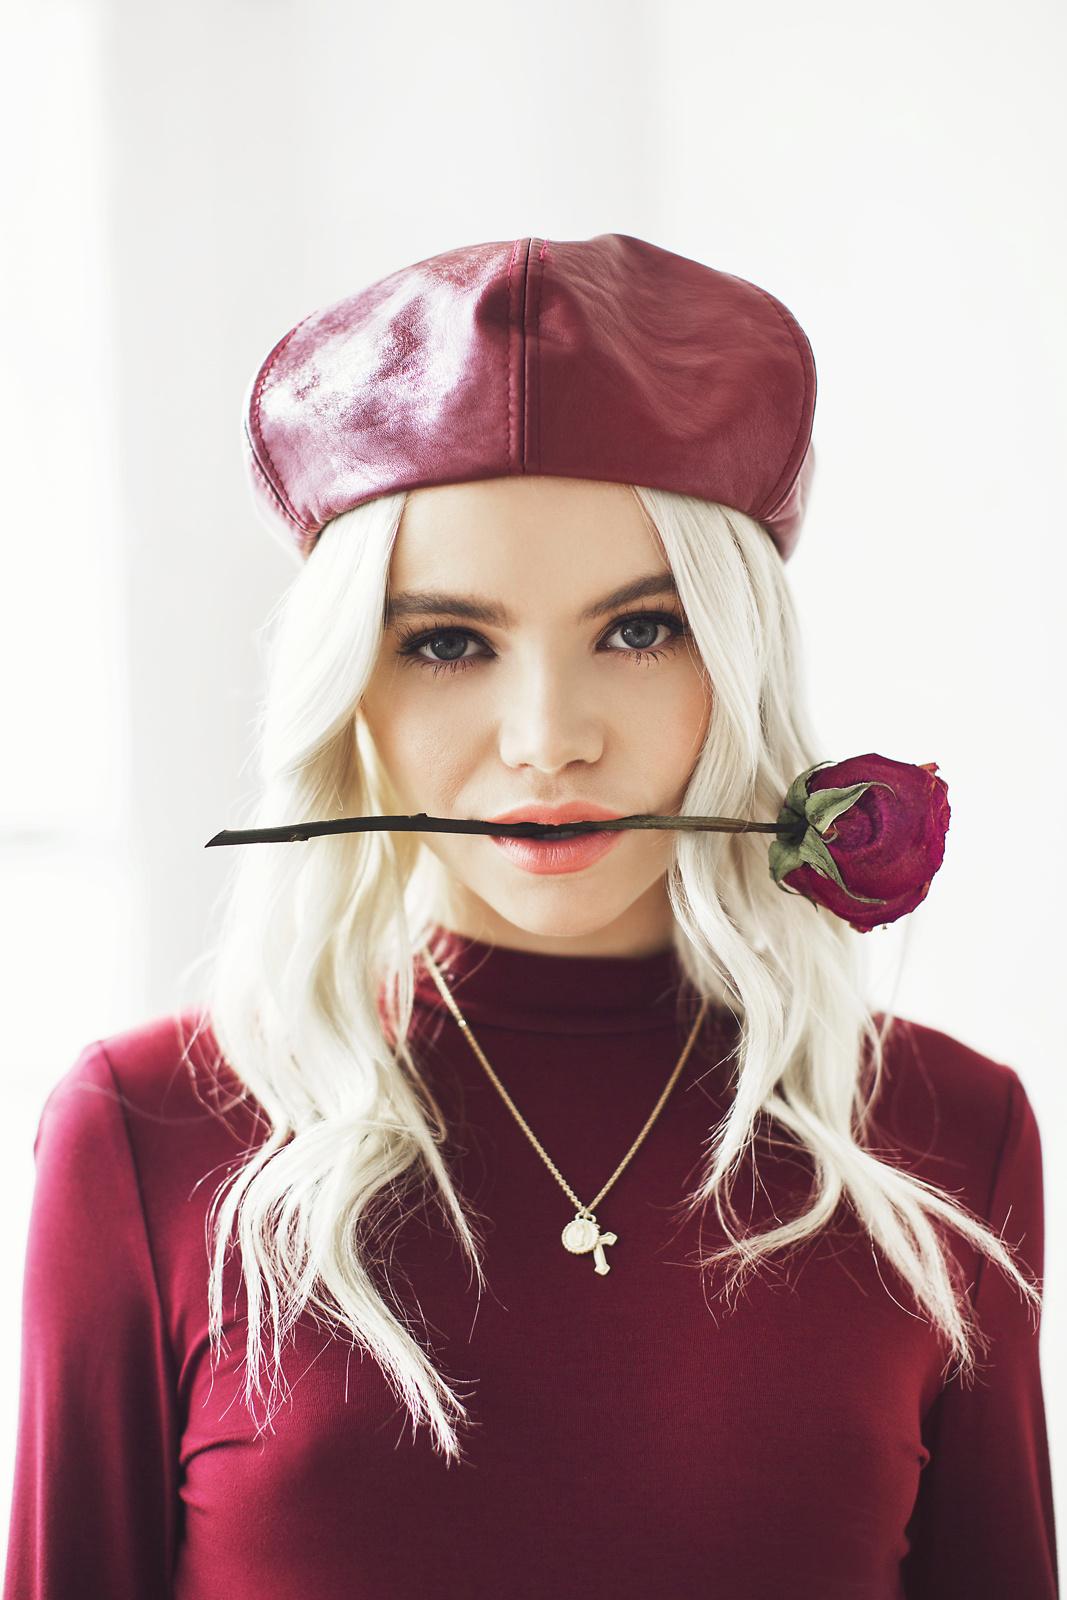 Zoe Elyse